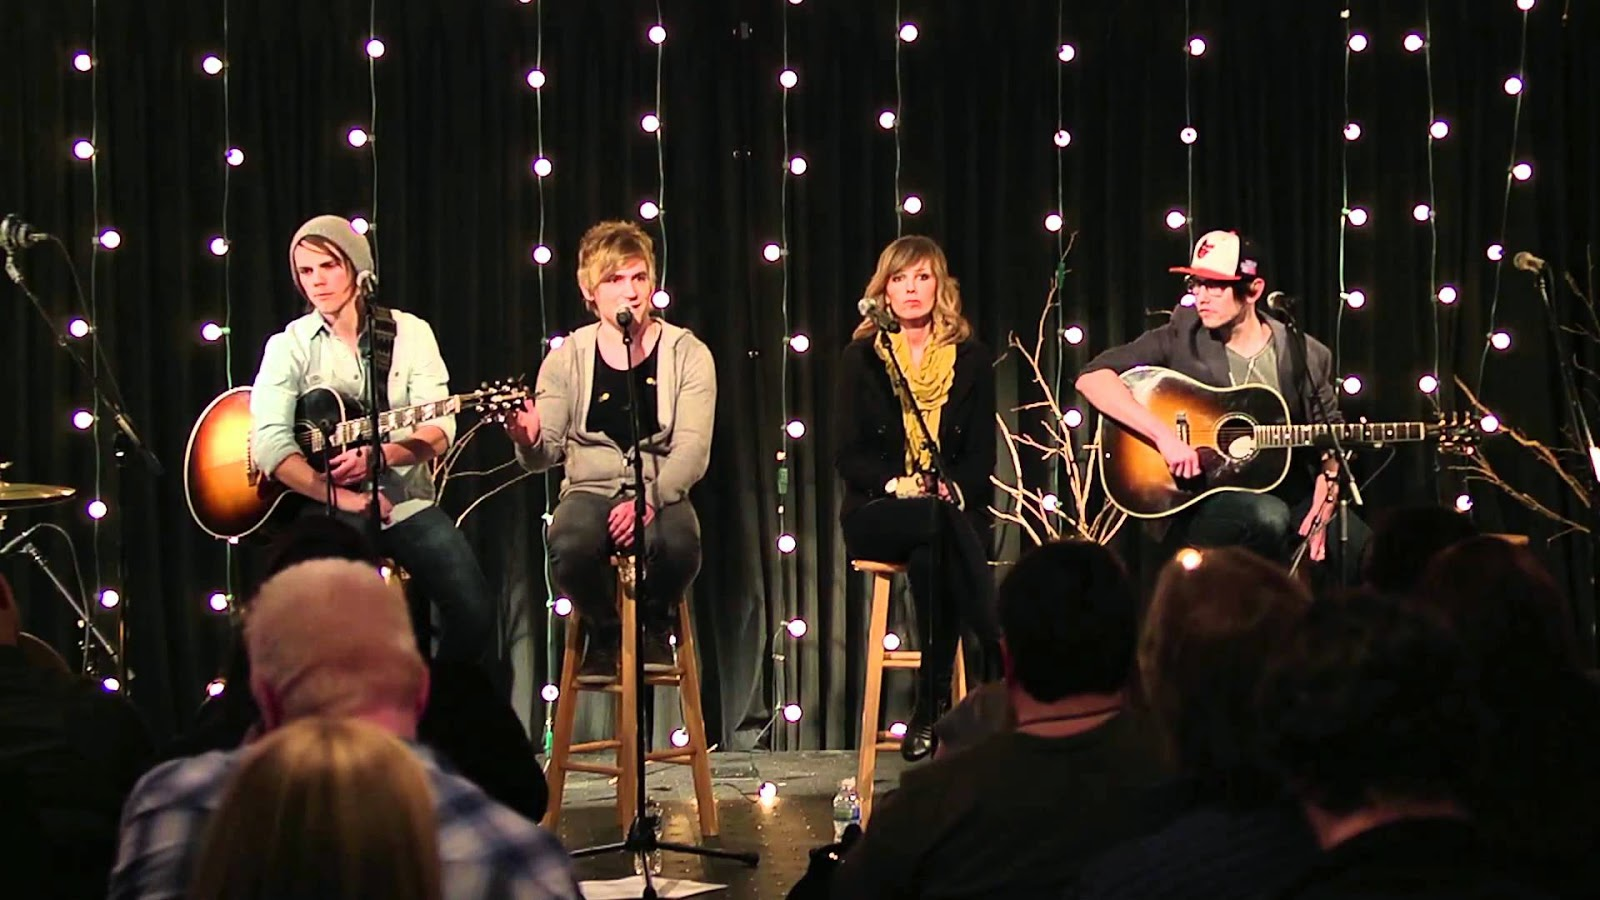 Elevation Worship - Wake Up the Wonder 2014 Band Members